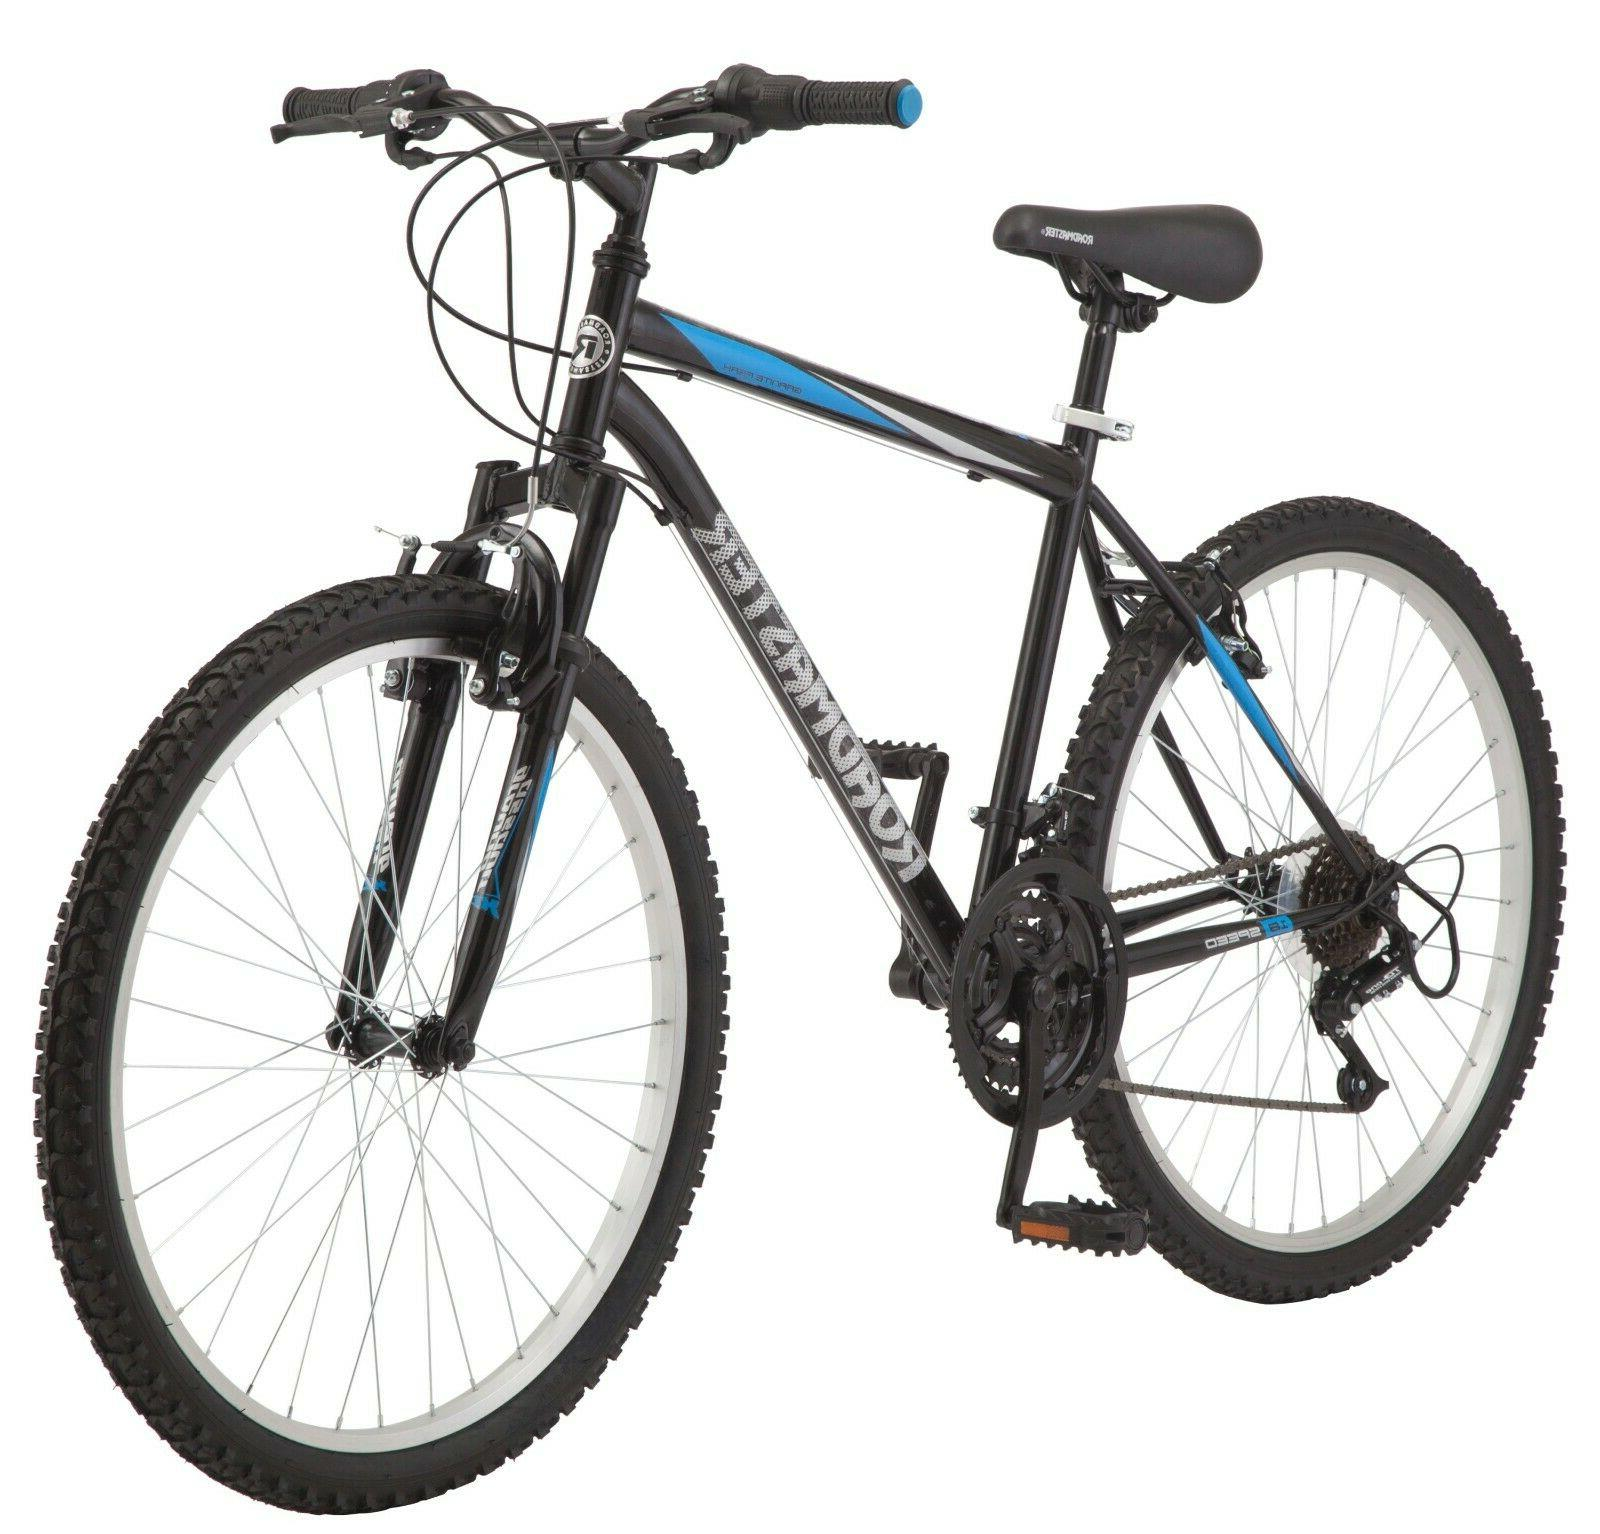 "Mountain Bike 26"" Inch Roadmaster Granite Peak Men's 18 Spee"